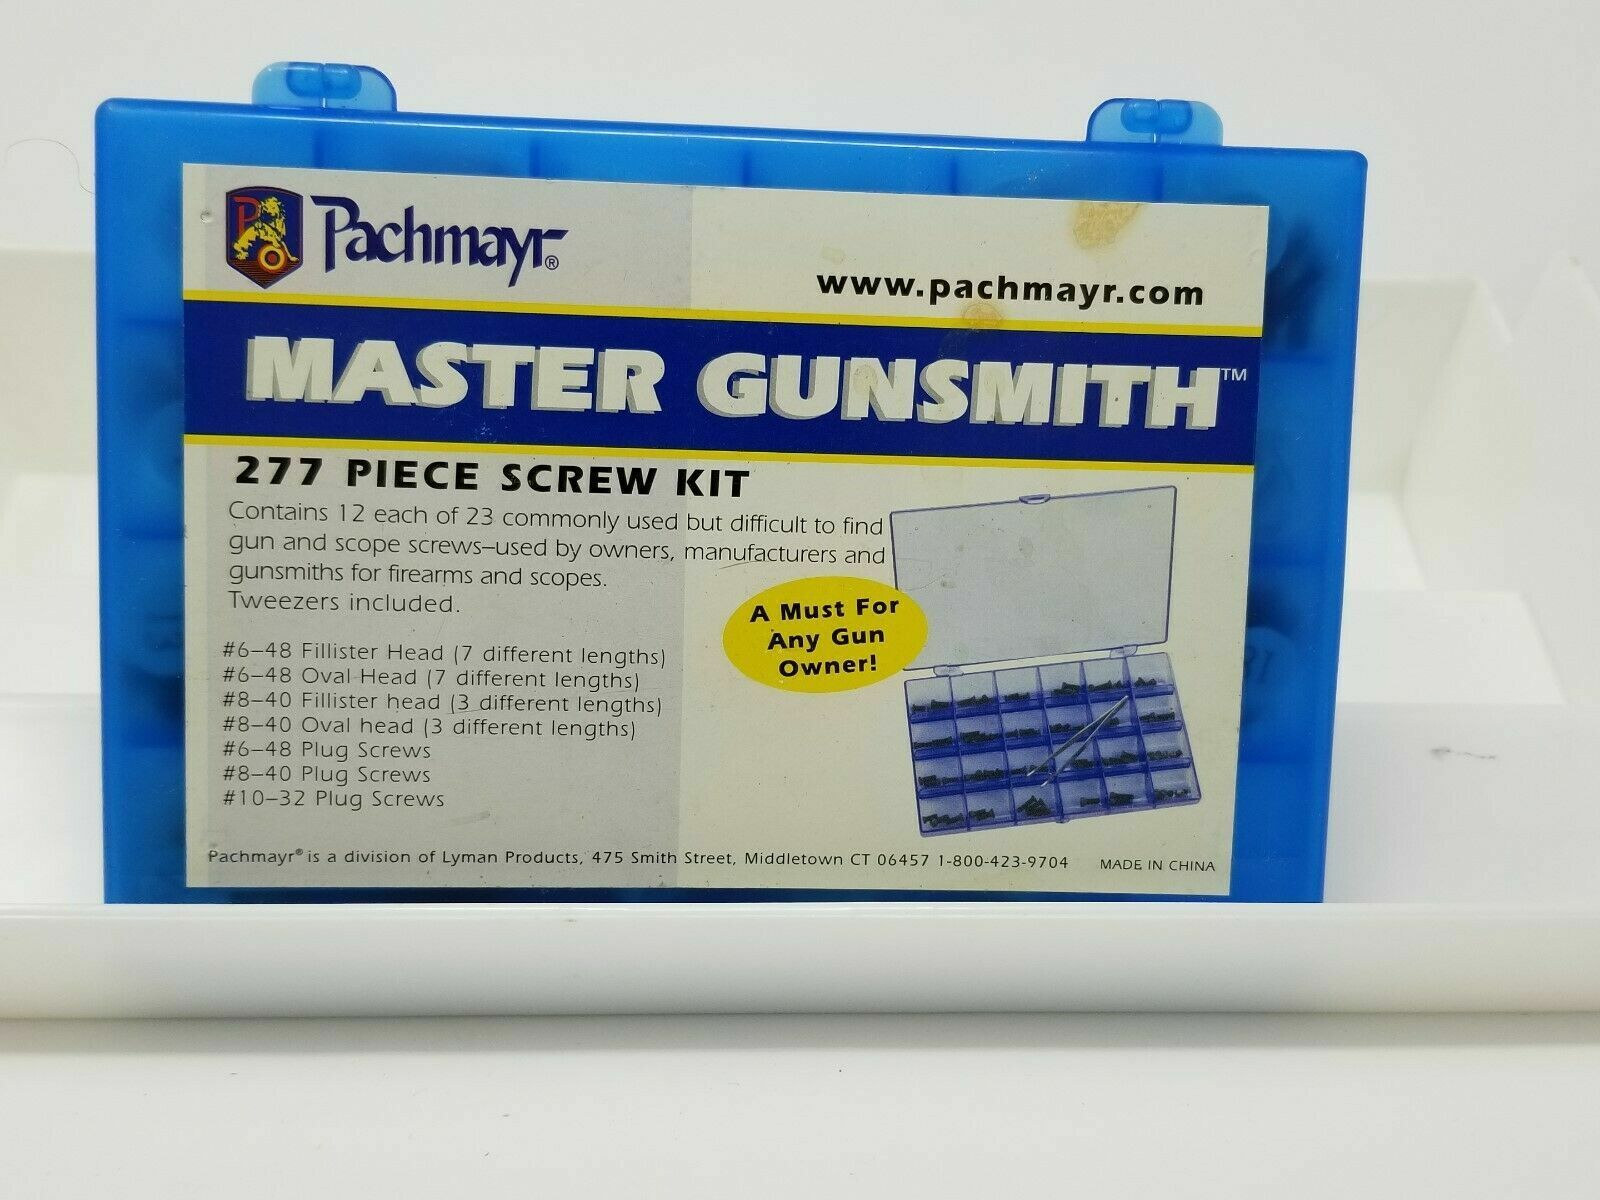 Pachmayr Master Gunsmith 277 Piece Screw Kit 03054